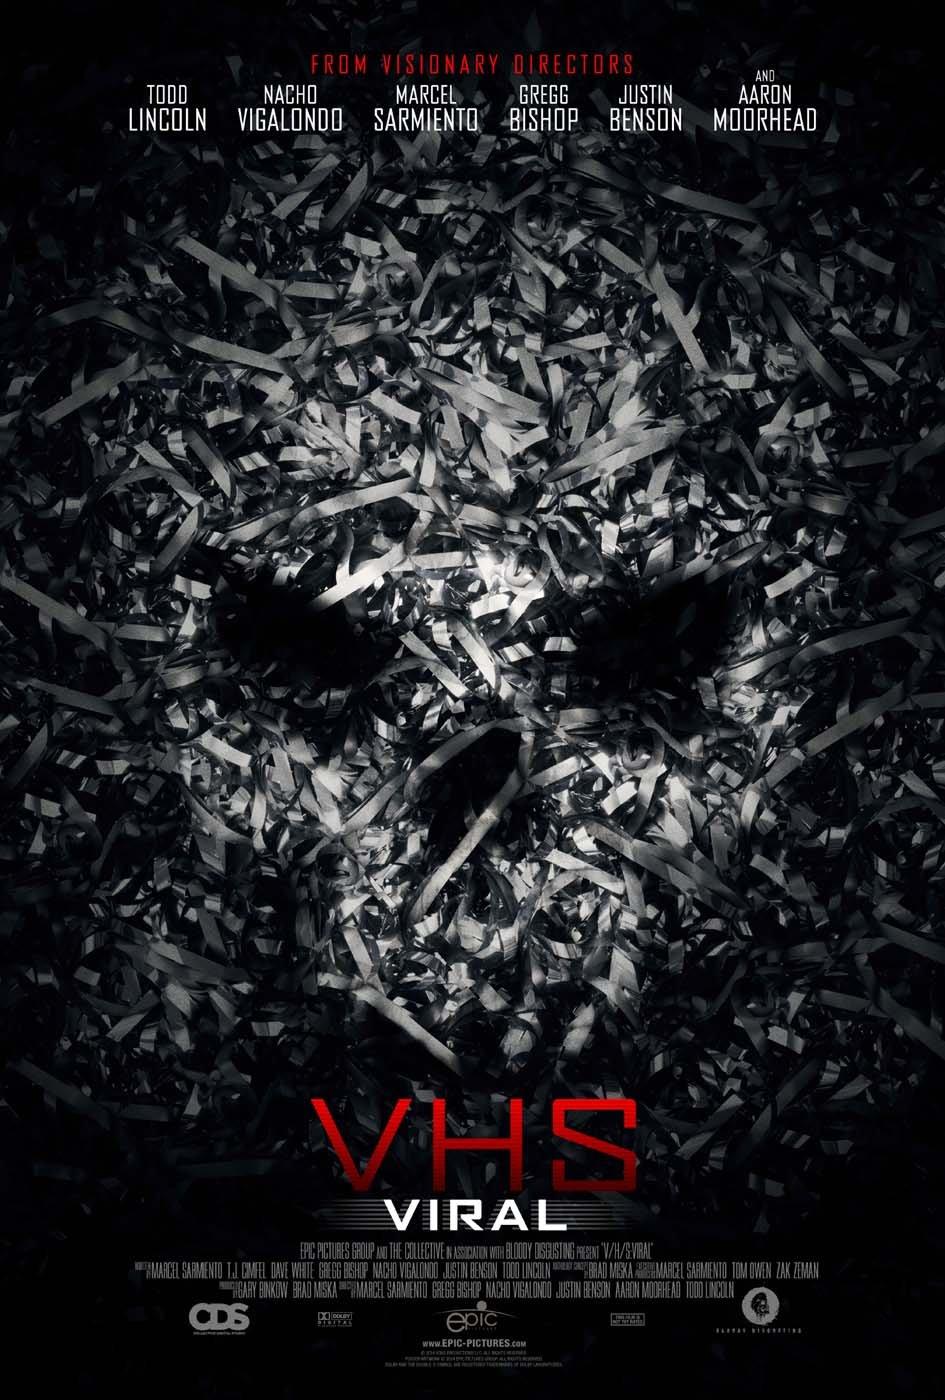 V/H/S VIRAL_POSTER_WEB-1